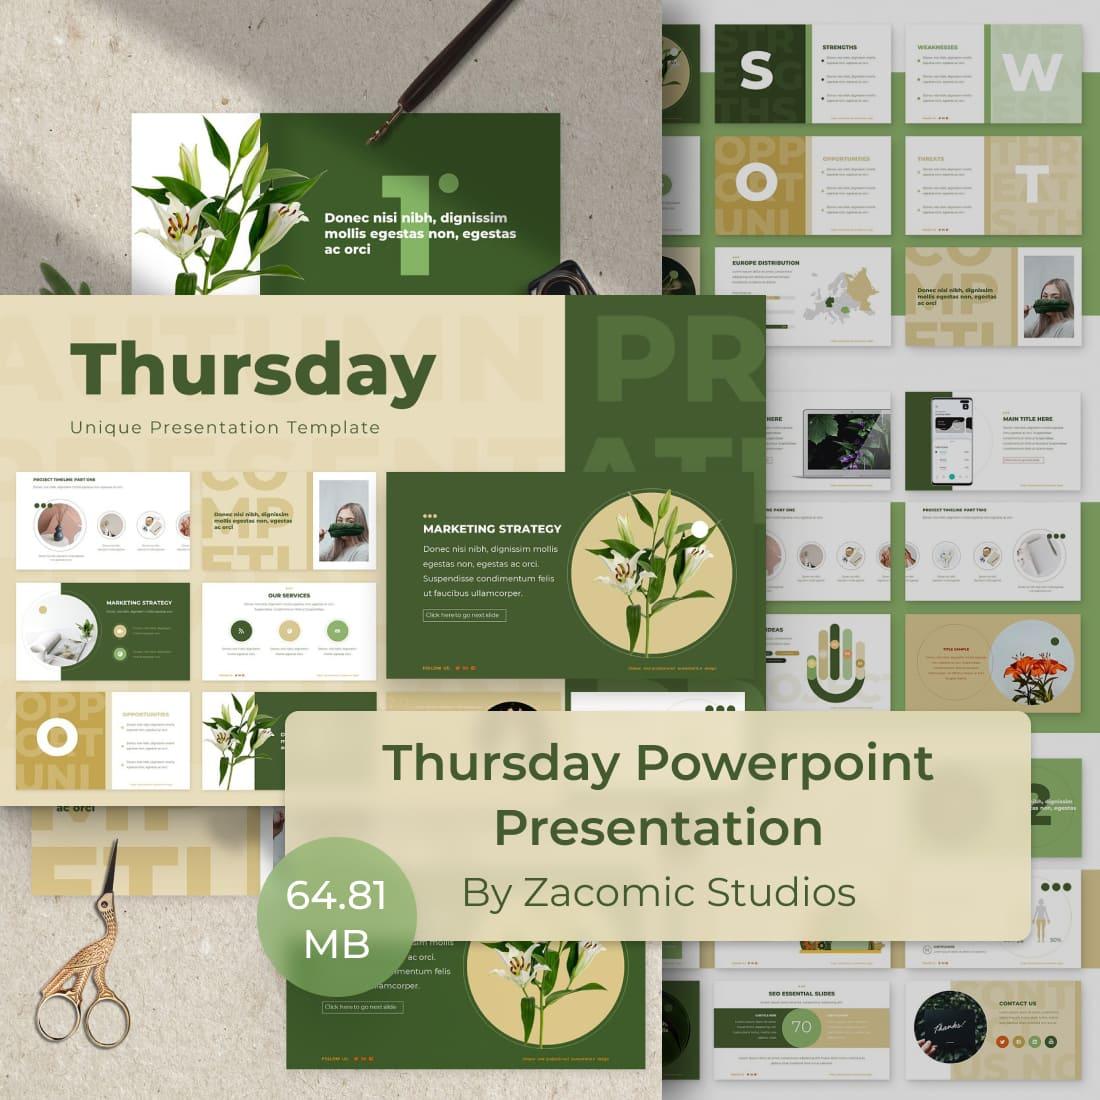 Thursday Powerpoint Presentation Template by MasterBundles.